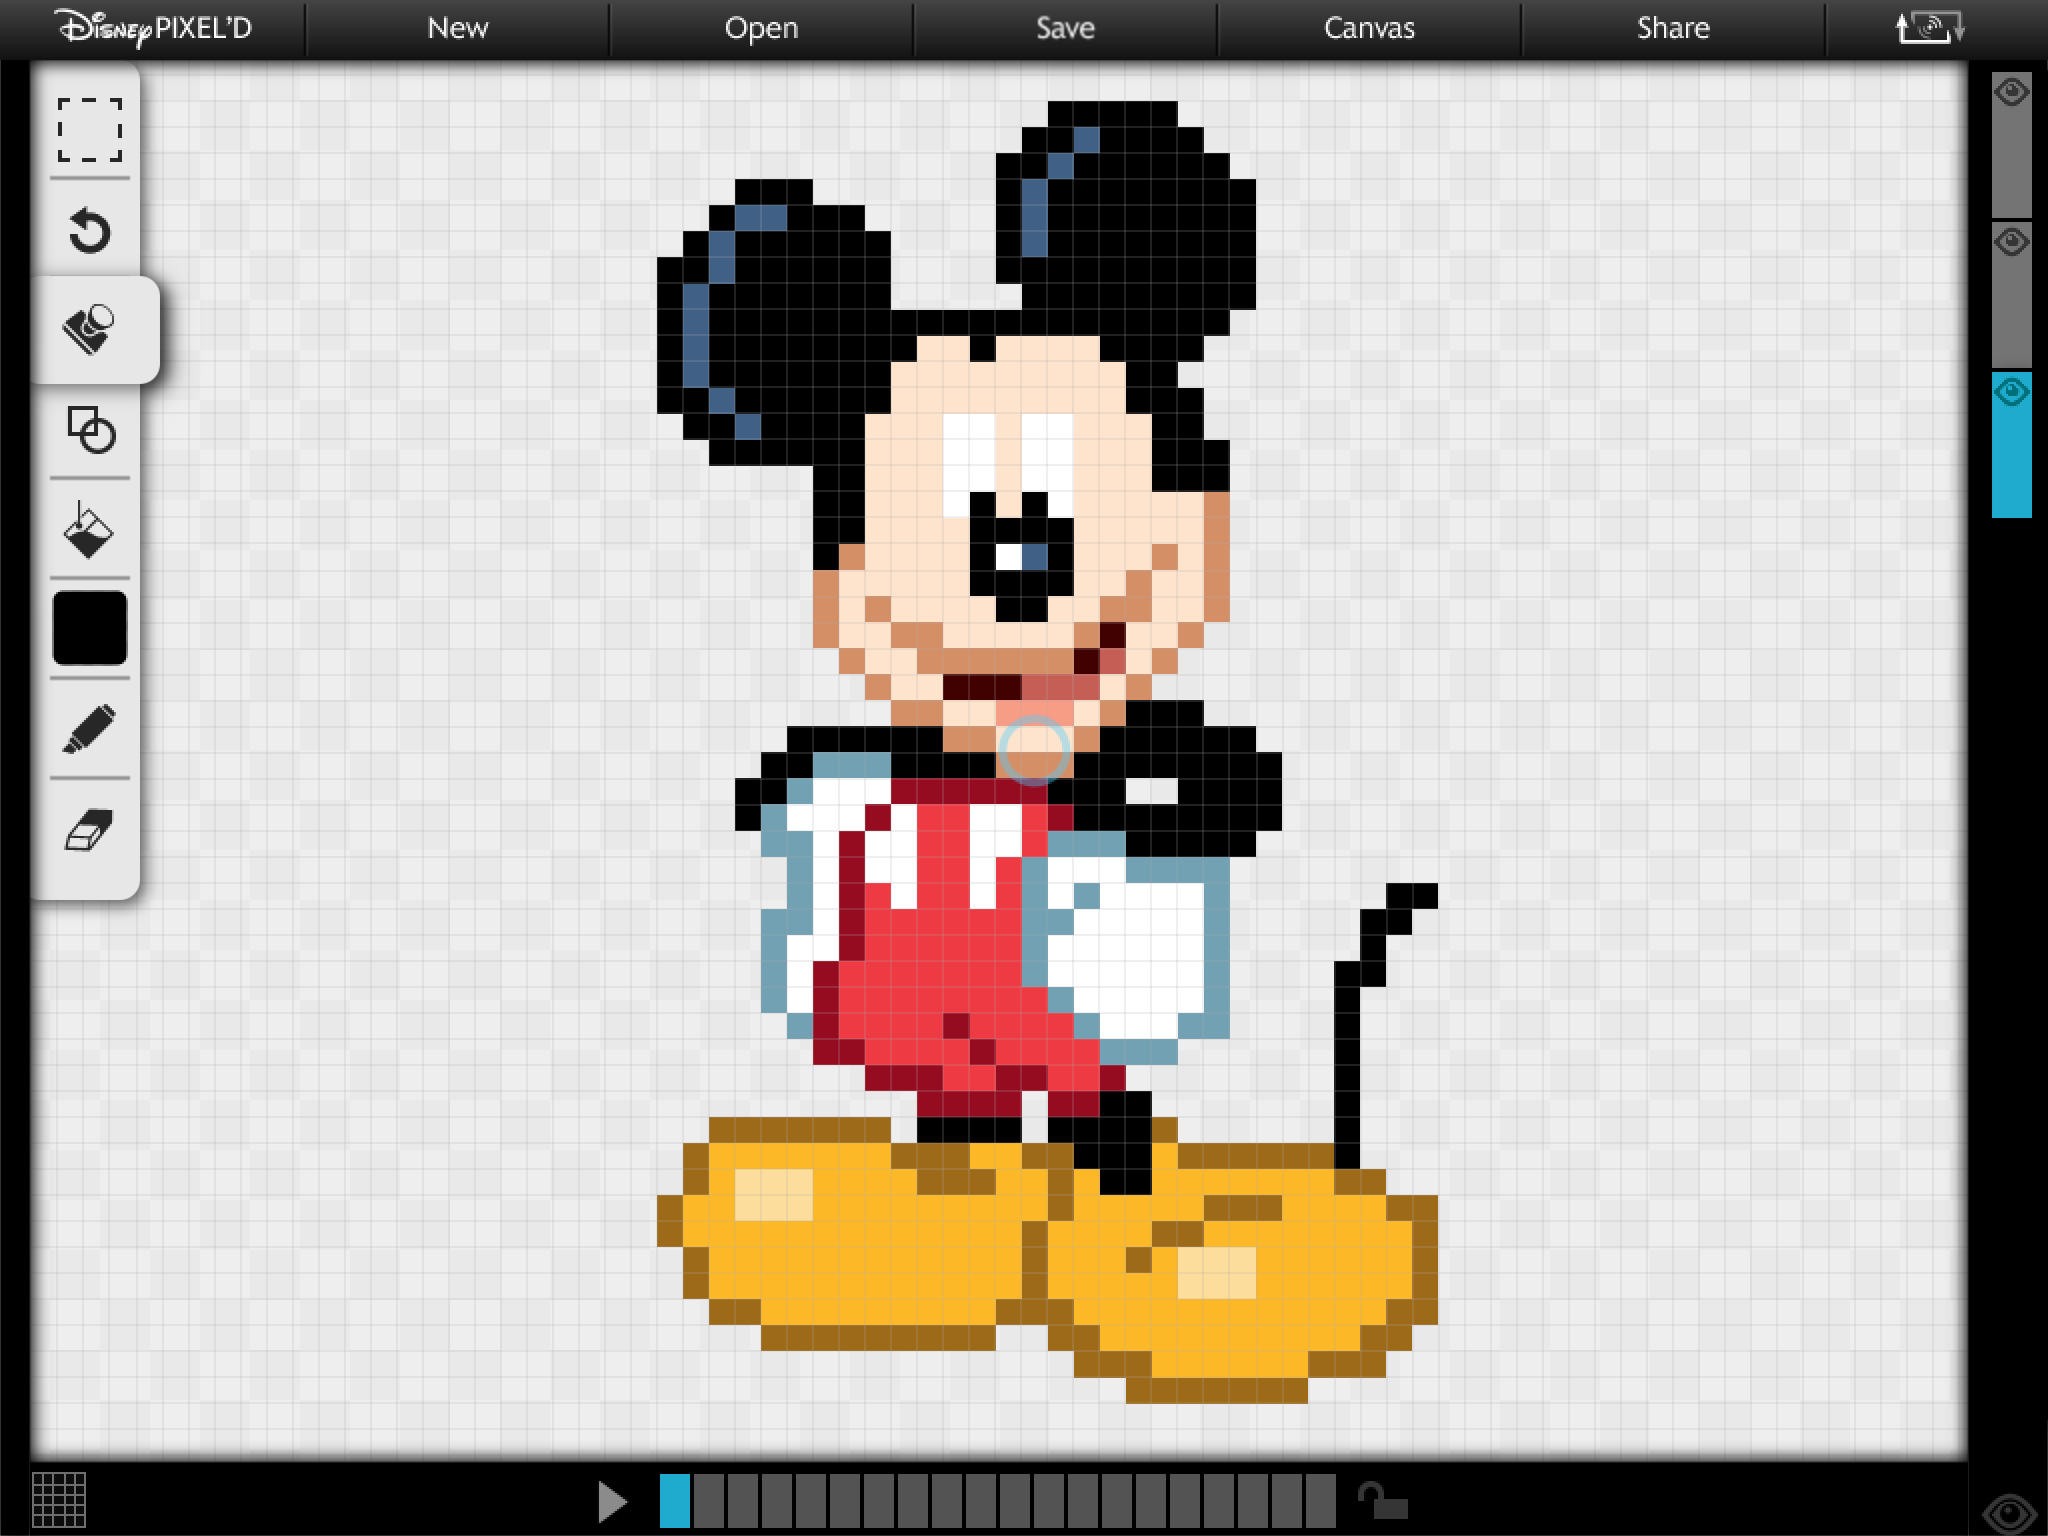 iOS App of the Day: Disney PIXEL'D